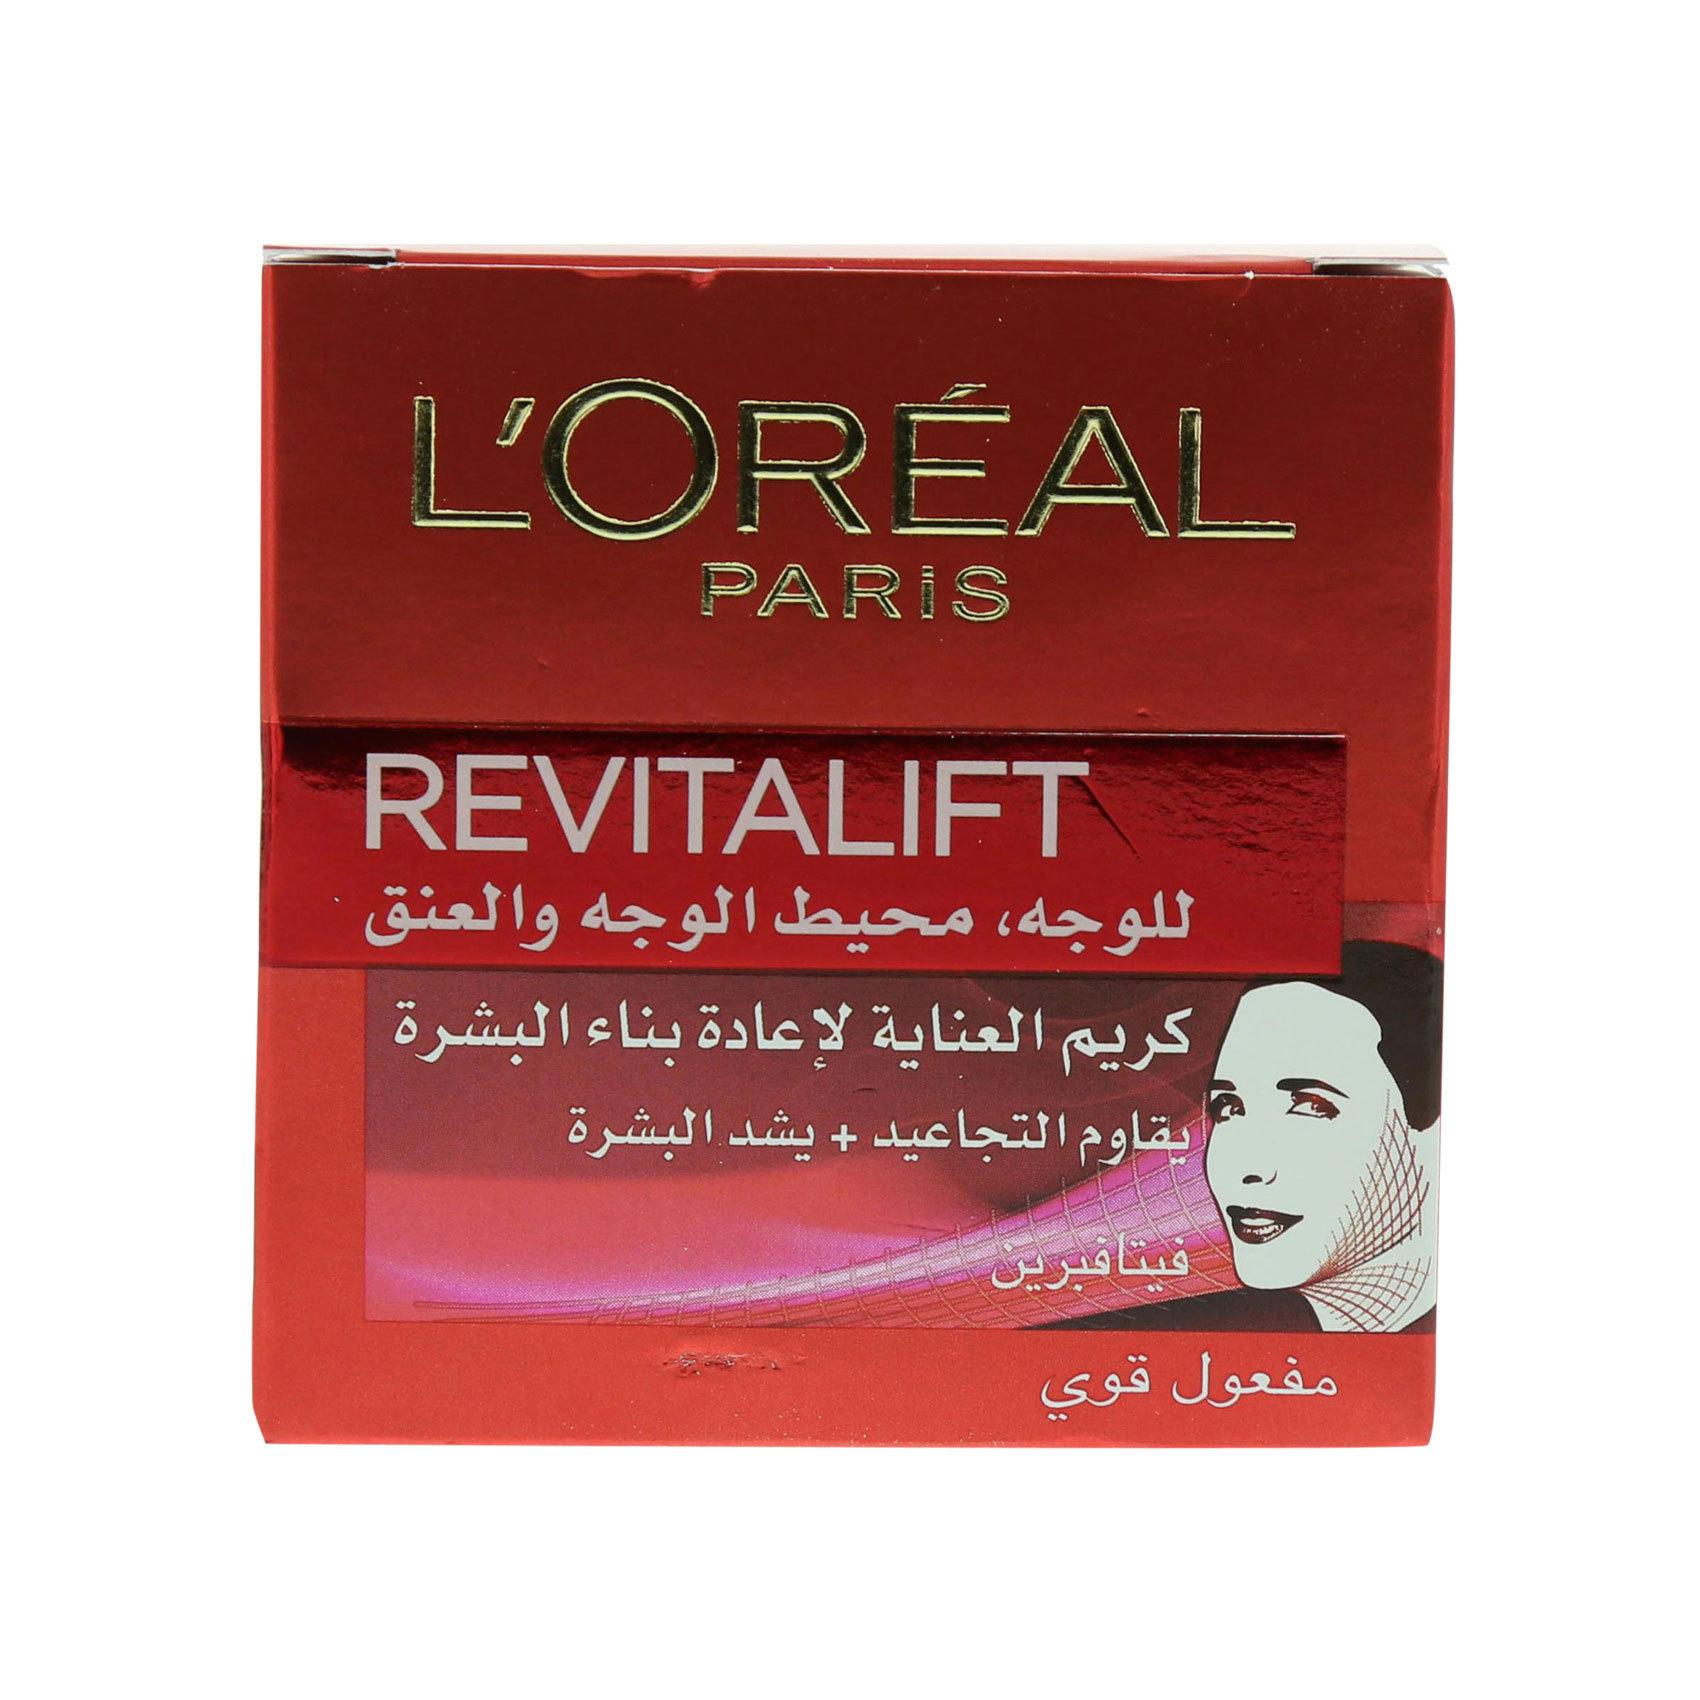 LOREAL DE REVITALIFT CONTOUR & JAWL